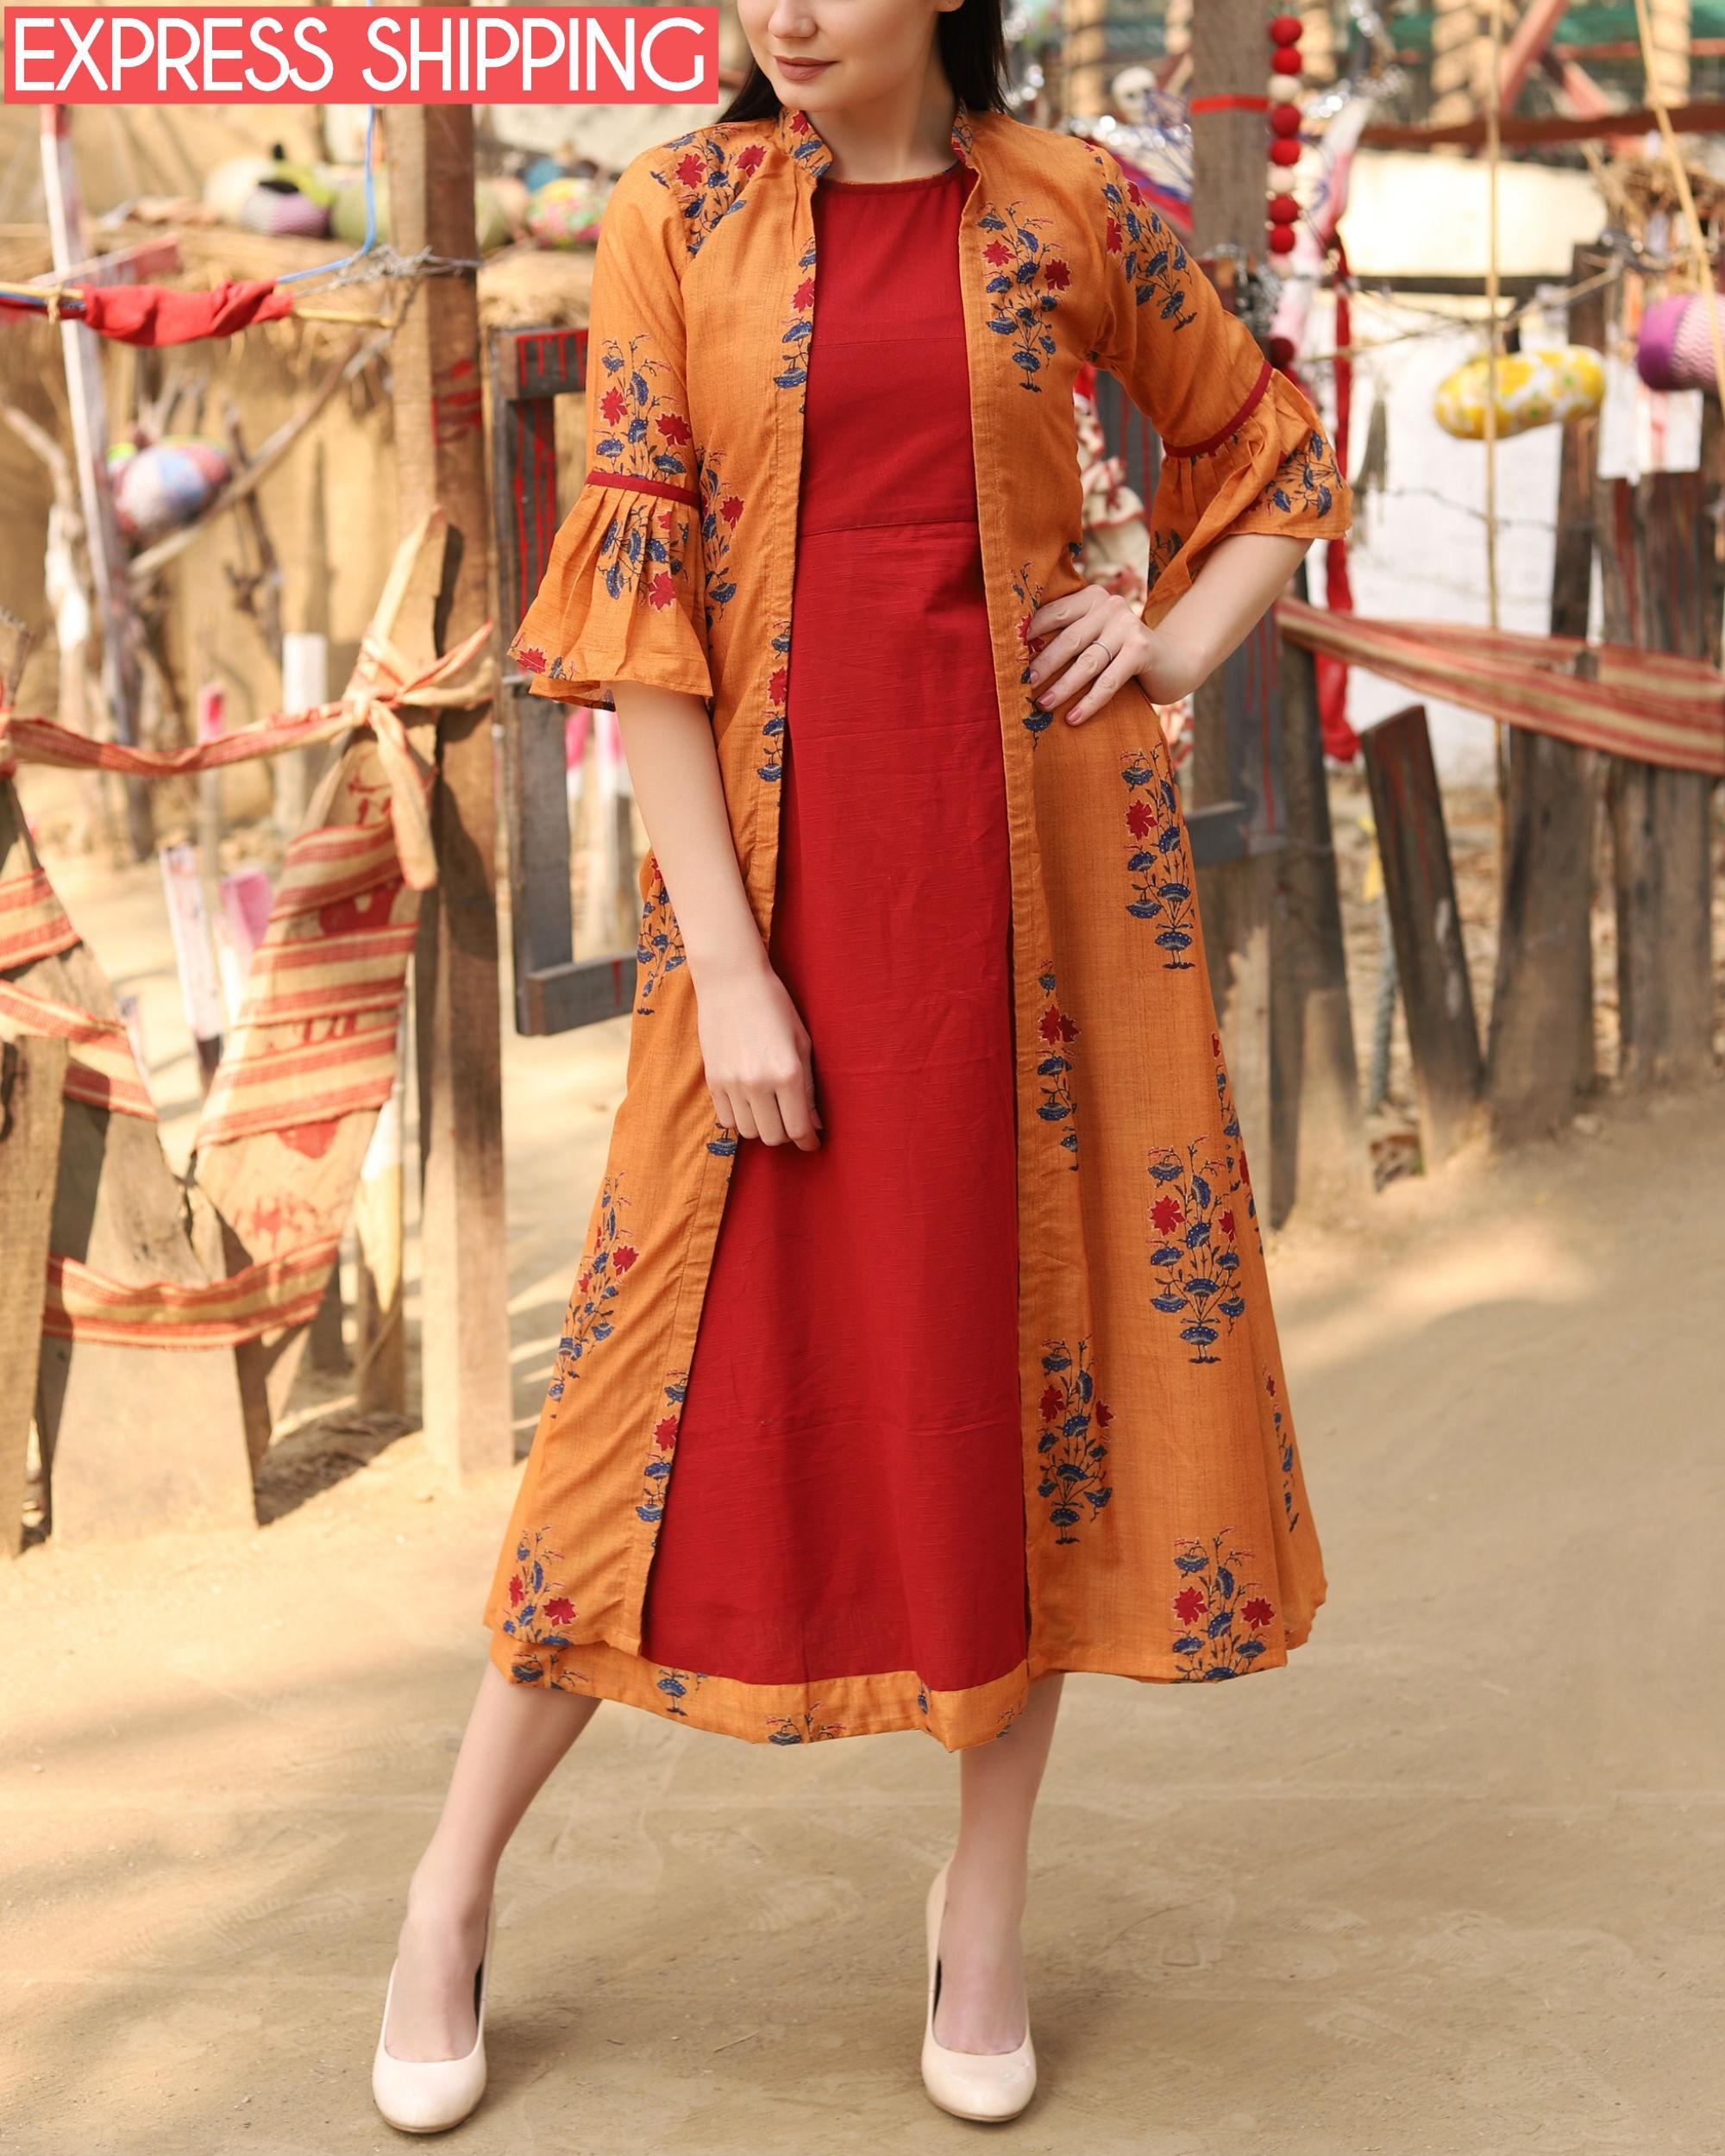 Rust orange and red jacket dress